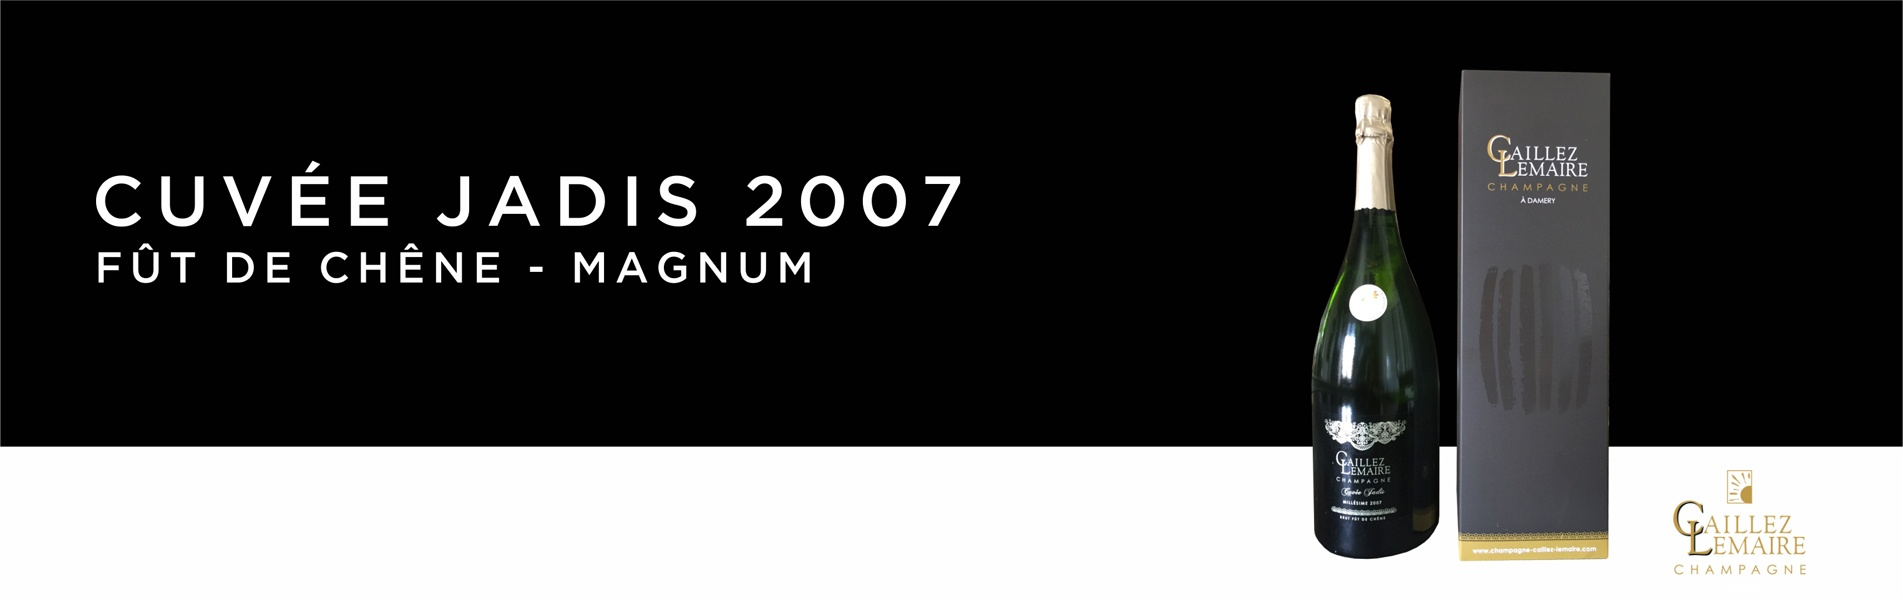 Jadis 2007 - Magnum - Champagne Caillez-Lemaire